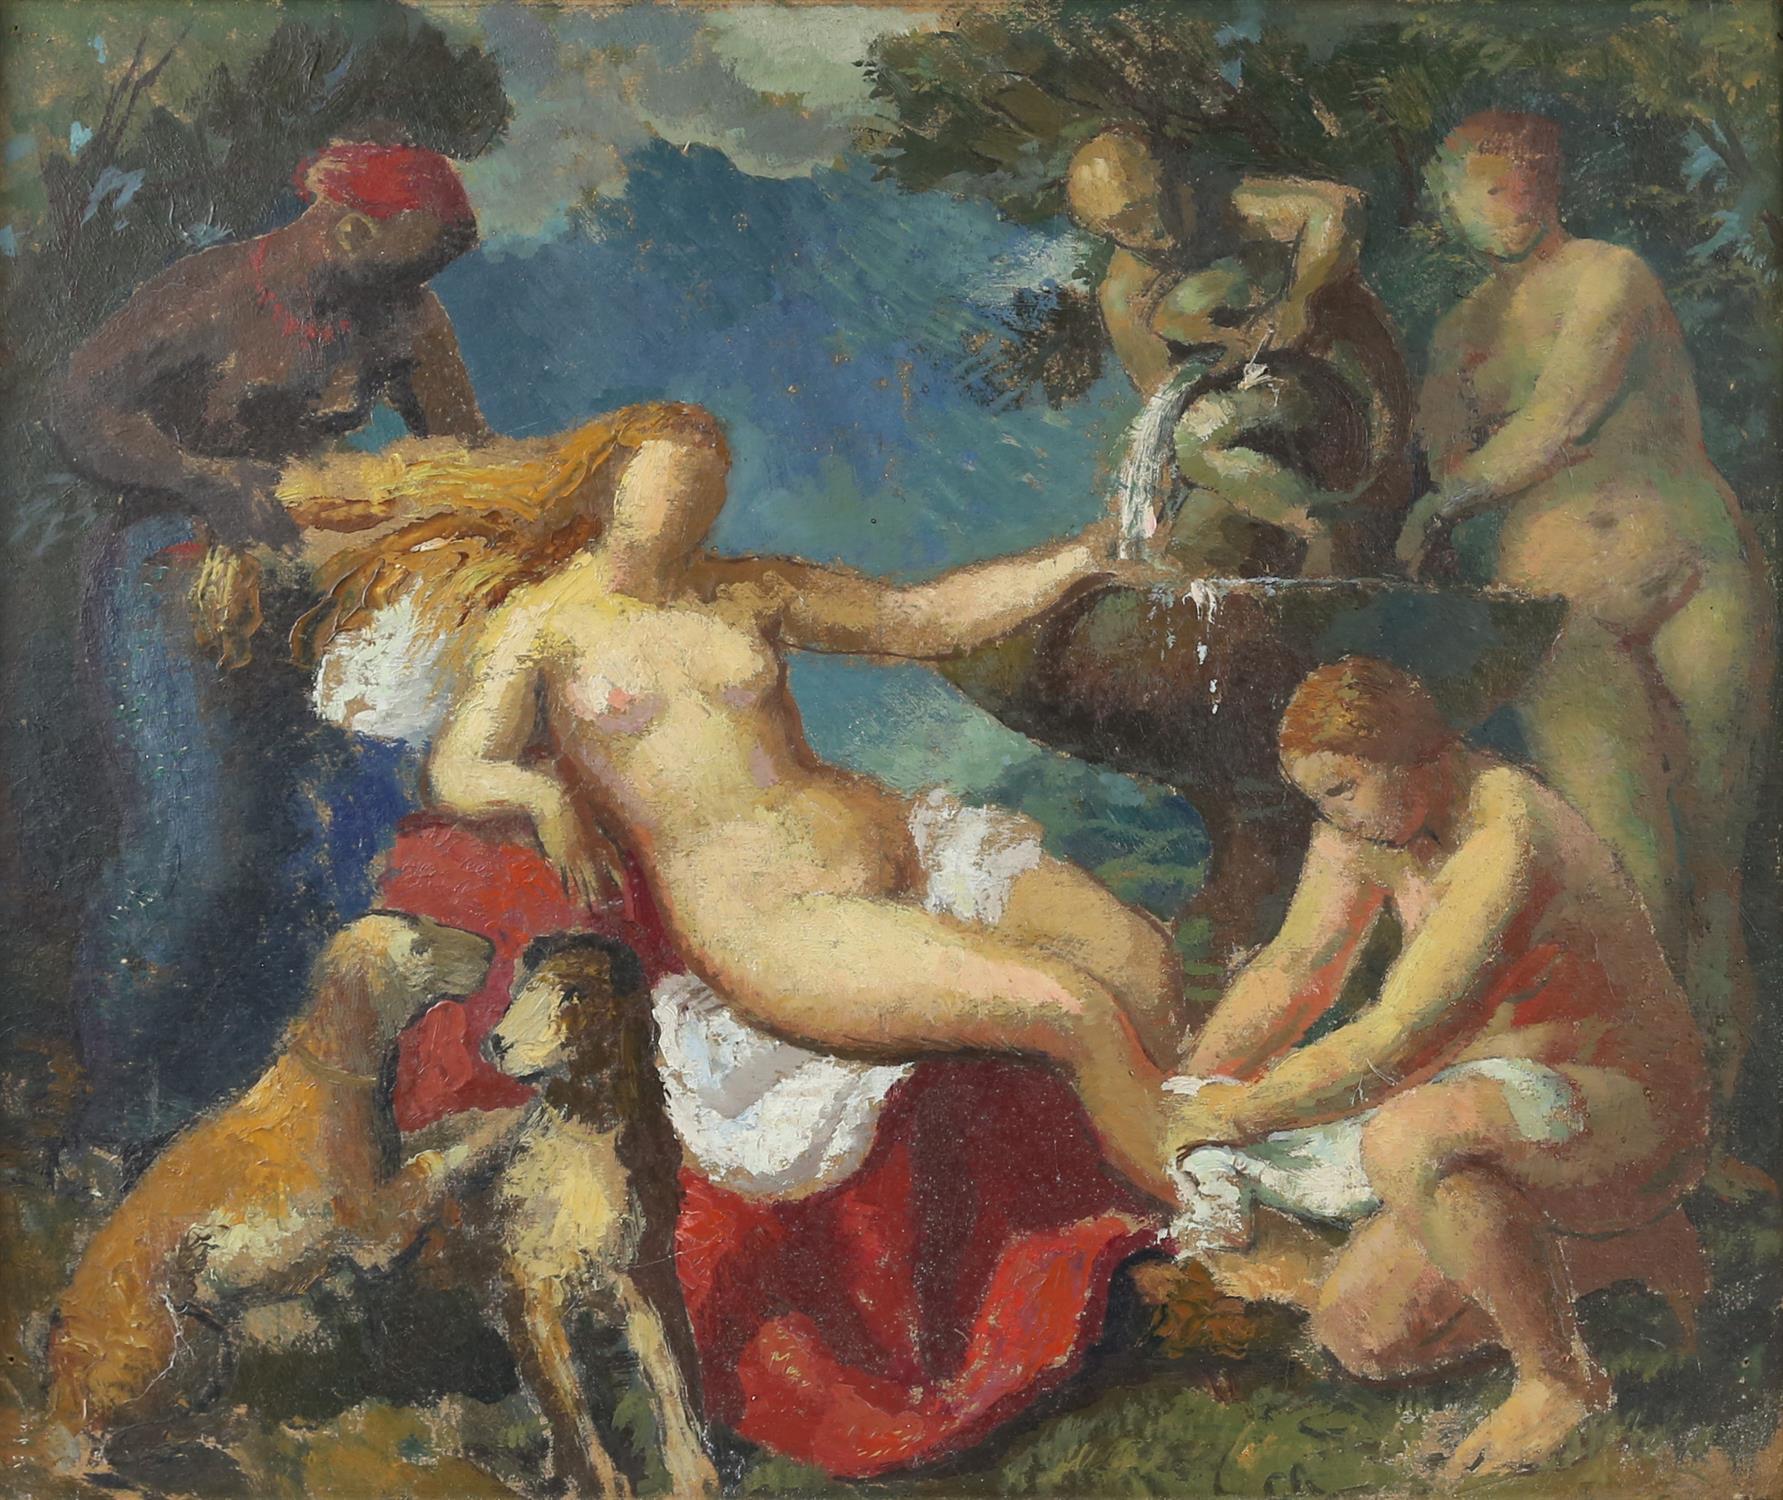 § Lionel Ellis (1903-1988), 'Diana's Bath'. Oil on board, unsigned, titled verso. 49 x 57cm.